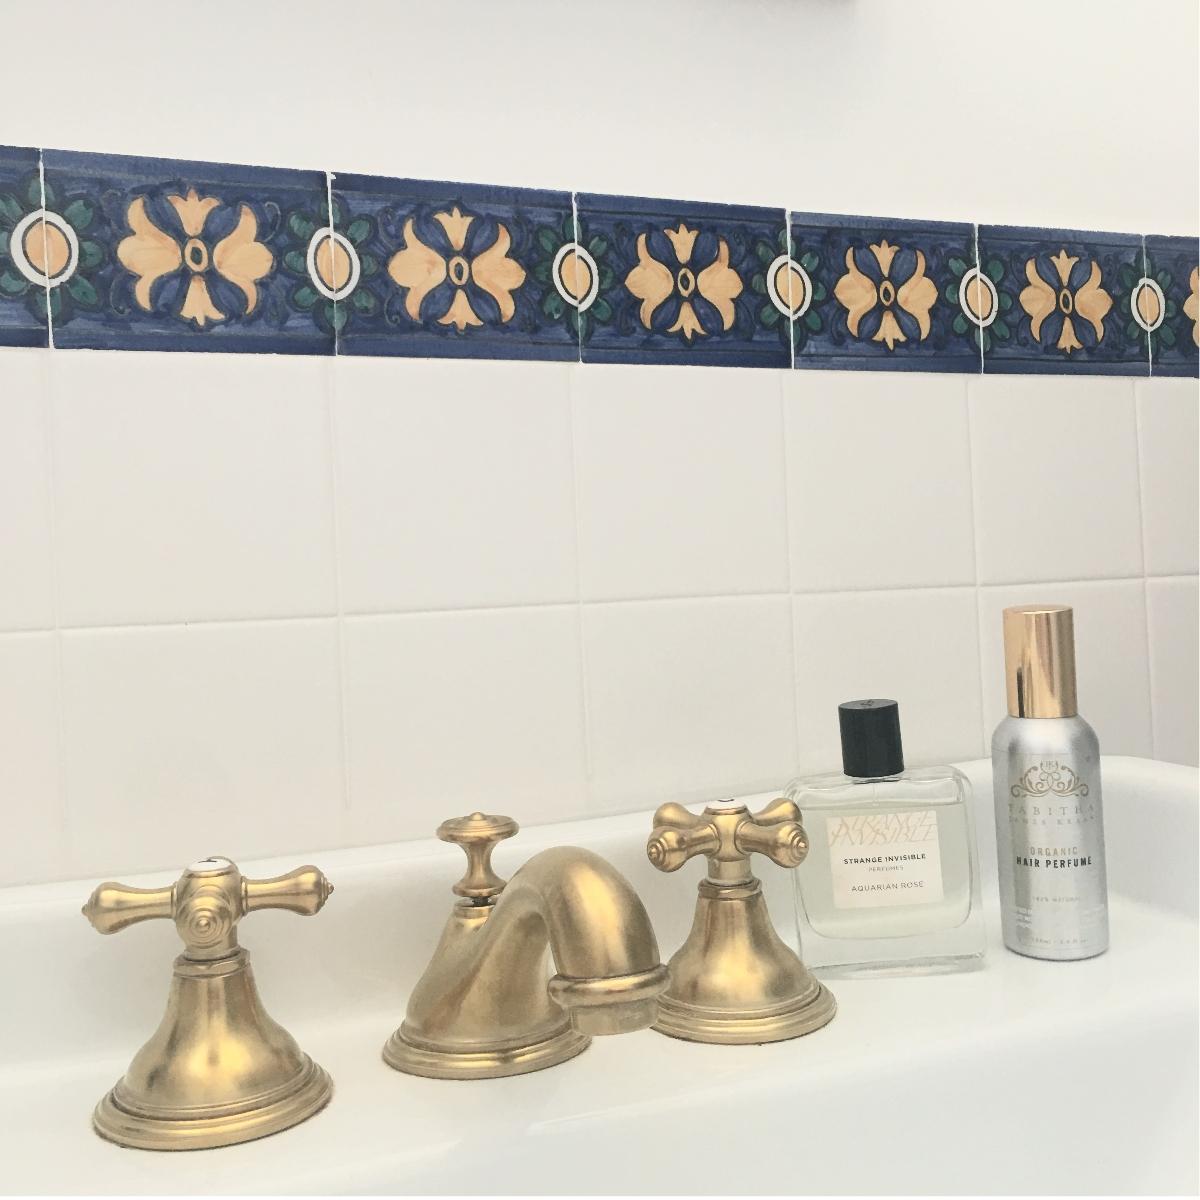 Tabitha James Kraan Organic Haircare - Strange Invisible Perfumes - Casa Do mercado - eco travel - florum fashion magazine - noelle lynne - lisbon portugal - inspiration - gold fixtures